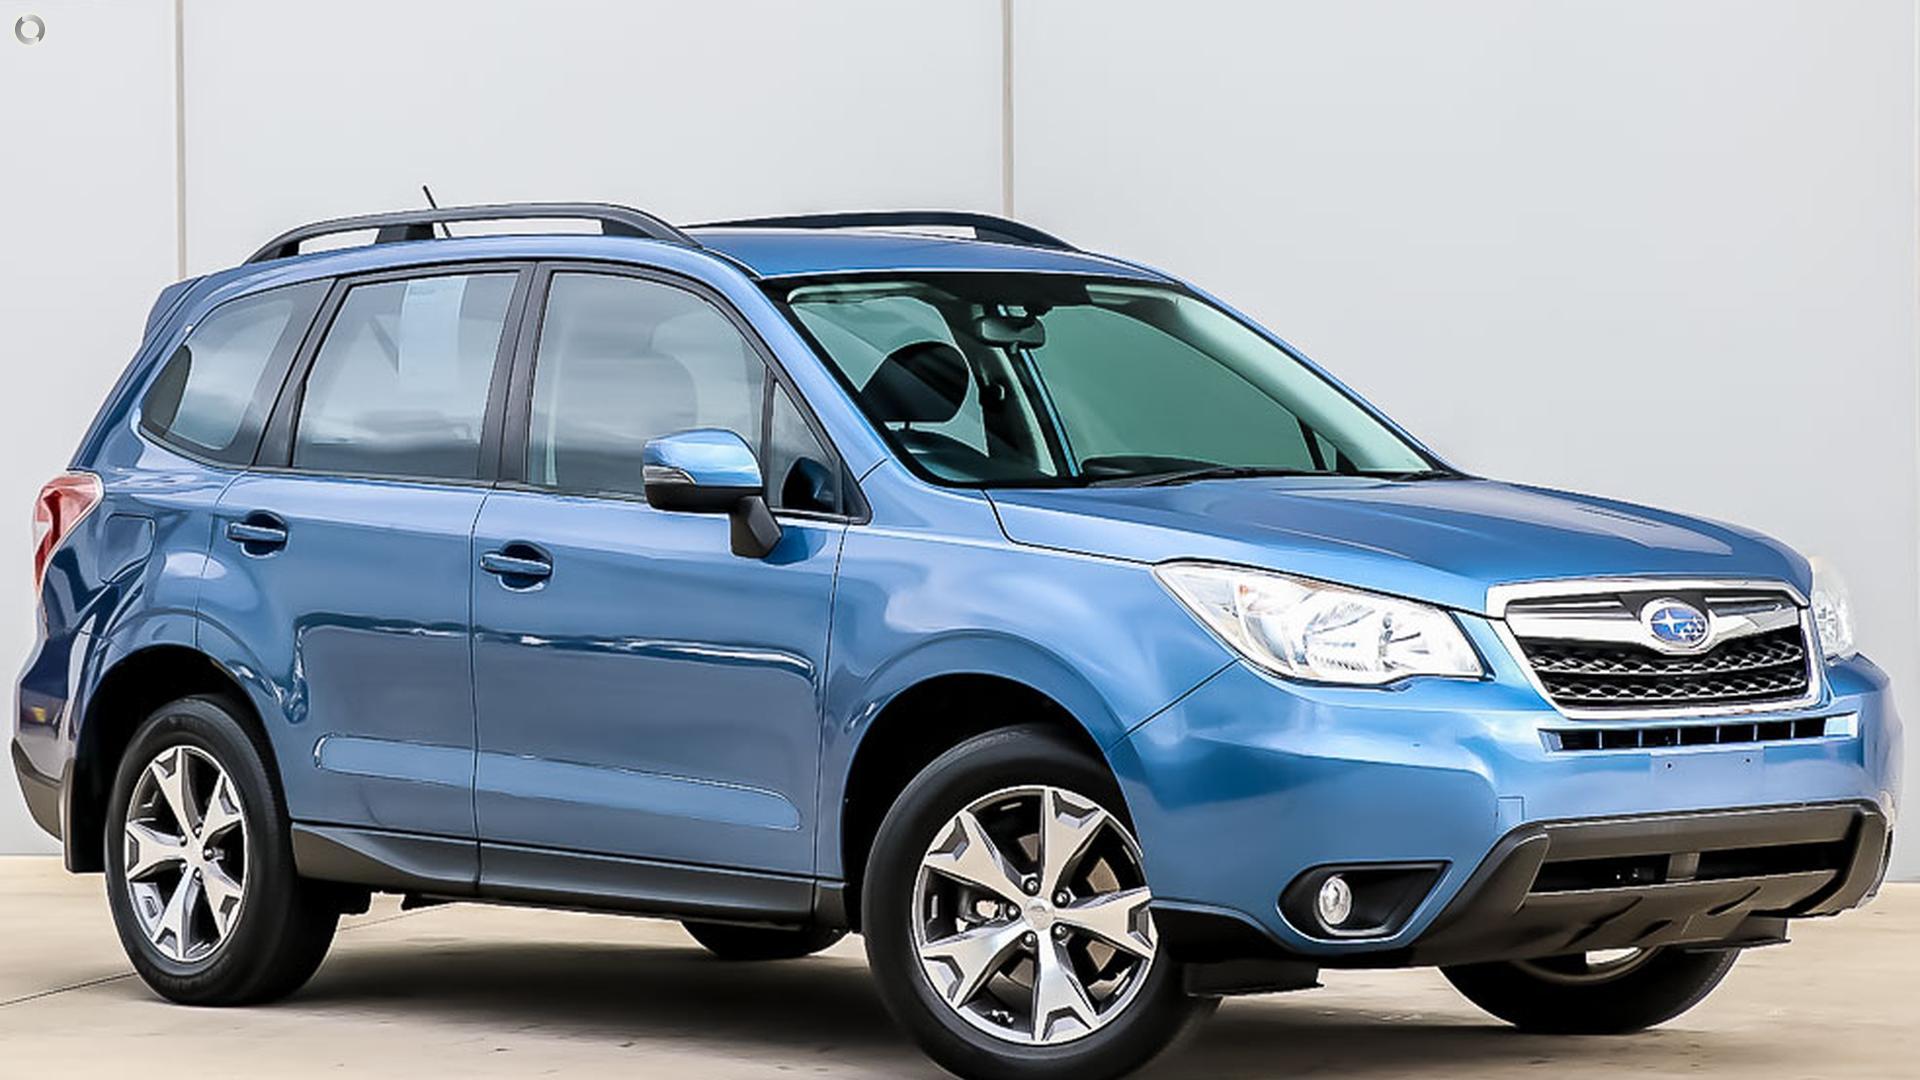 2014 Subaru Forester S4